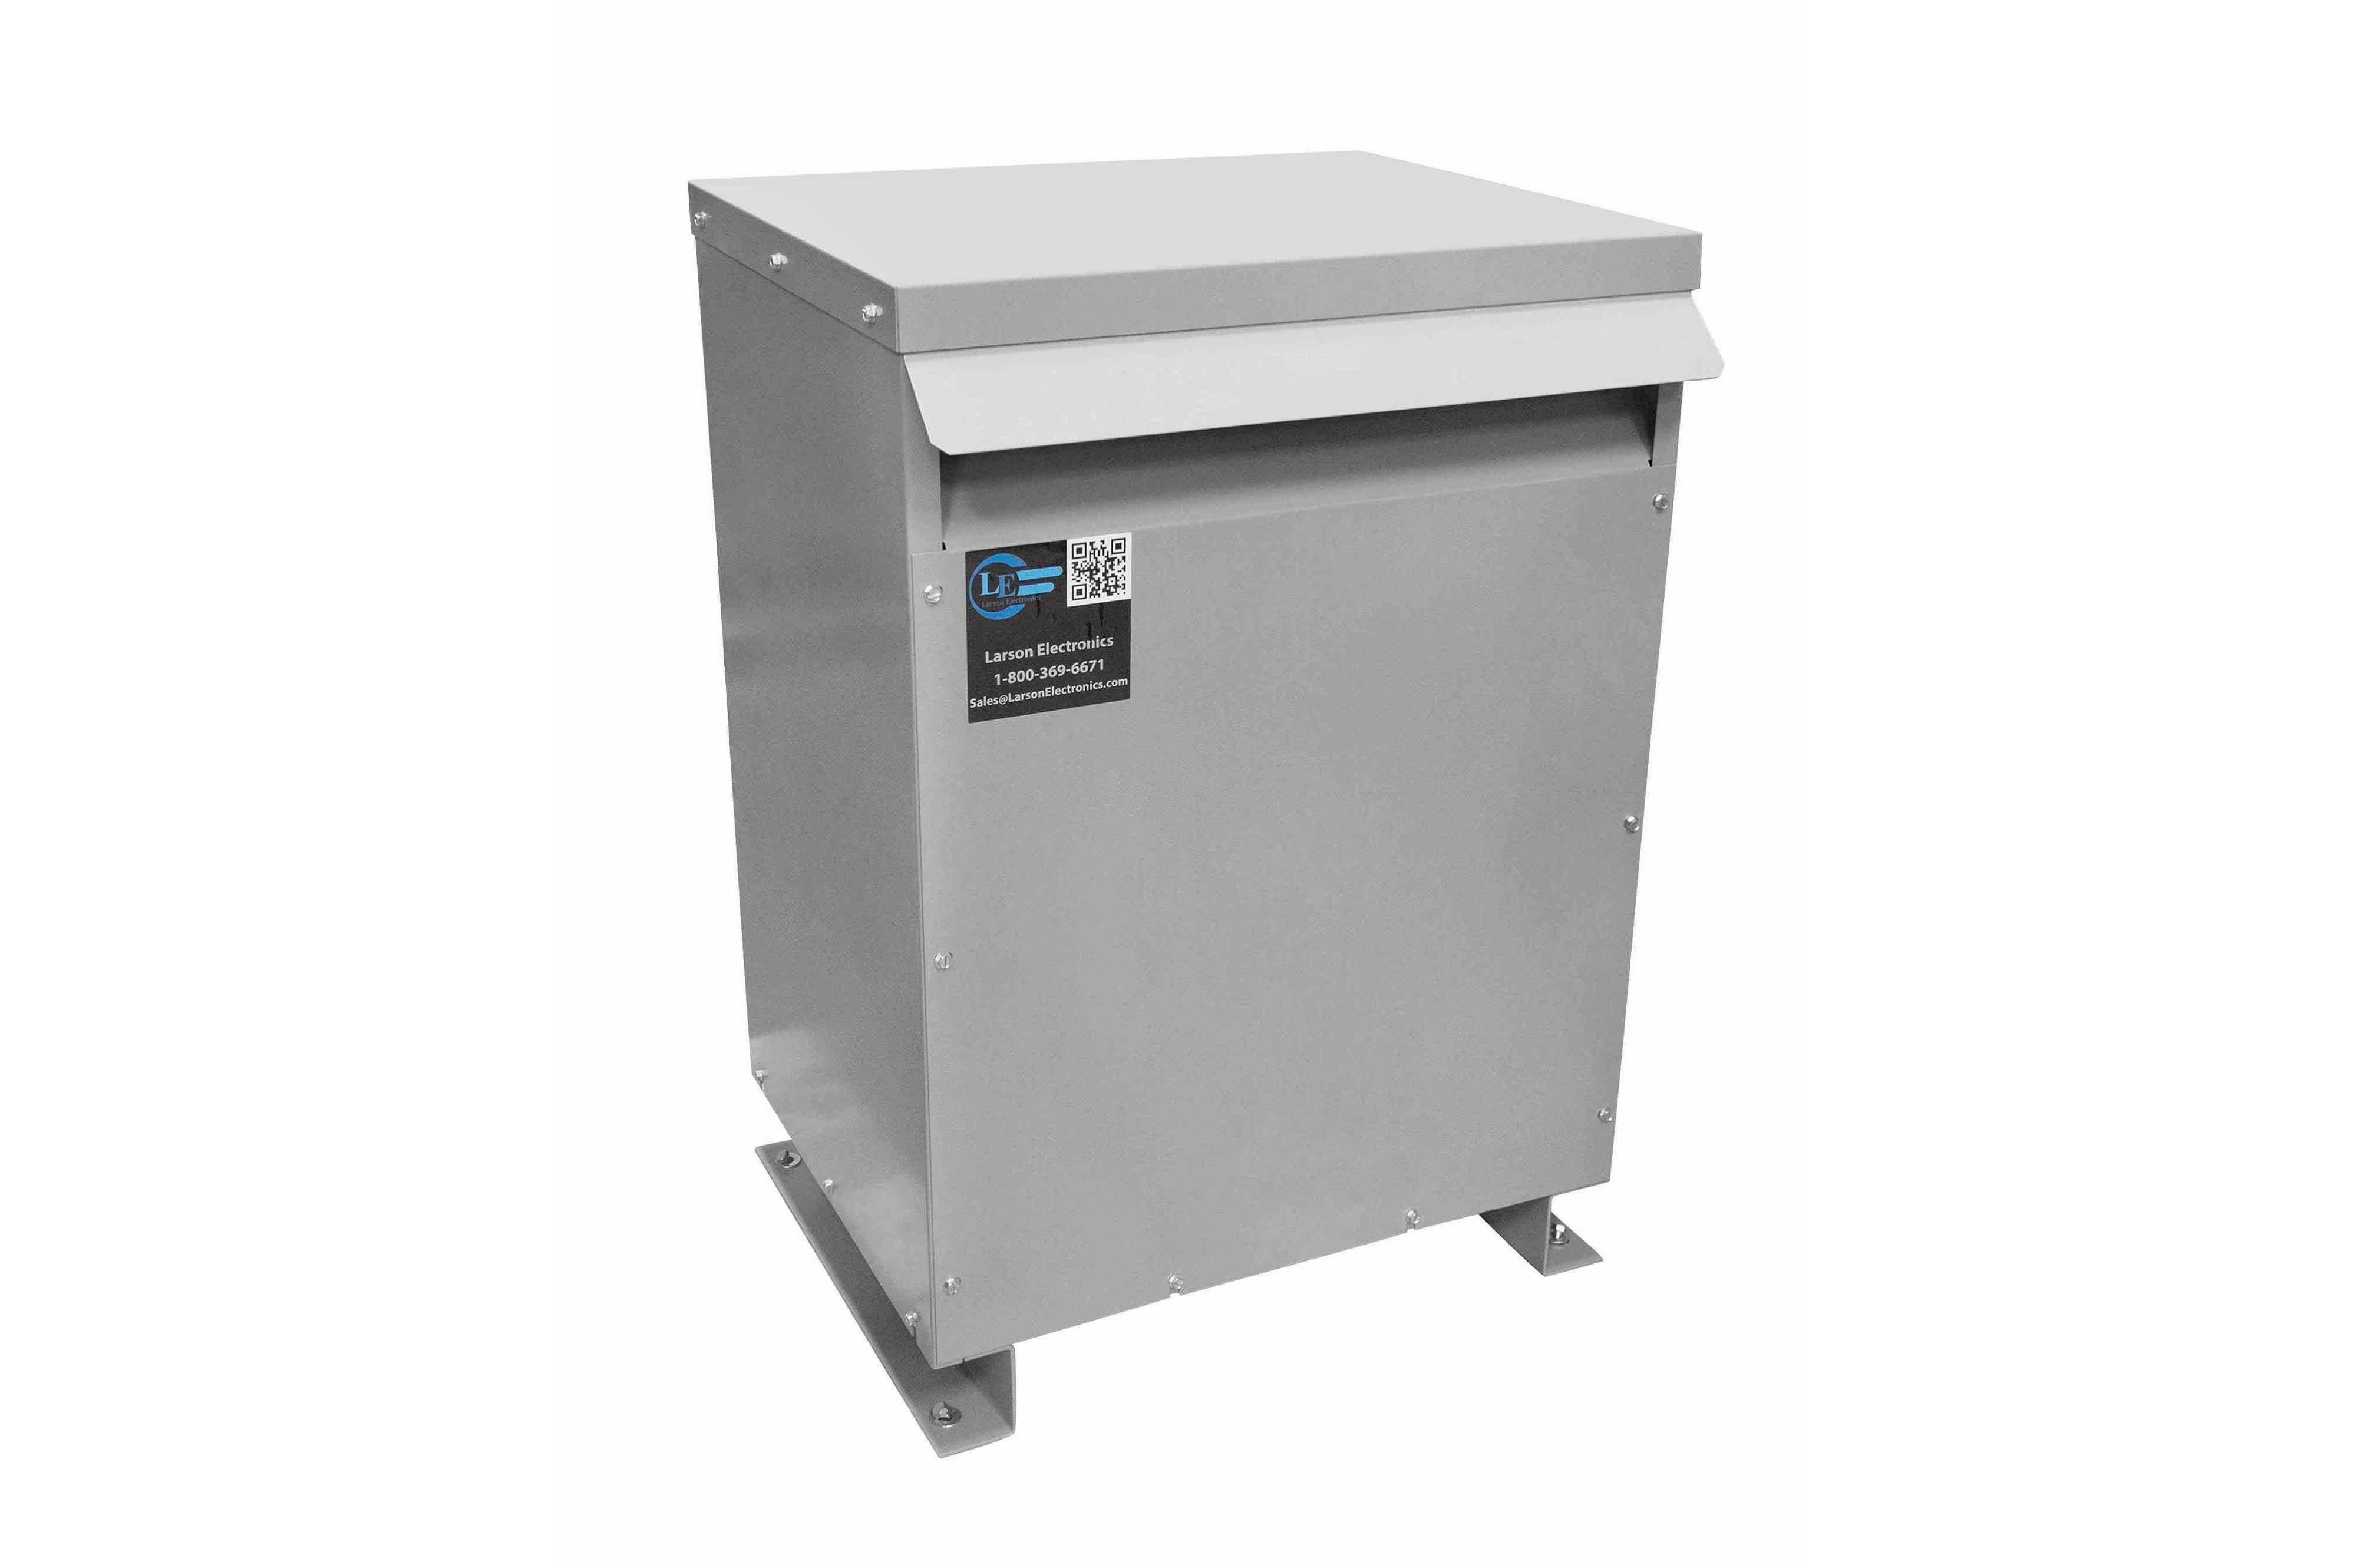 137.5 kVA 3PH Isolation Transformer, 208V Wye Primary, 240V/120 Delta Secondary, N3R, Ventilated, 60 Hz